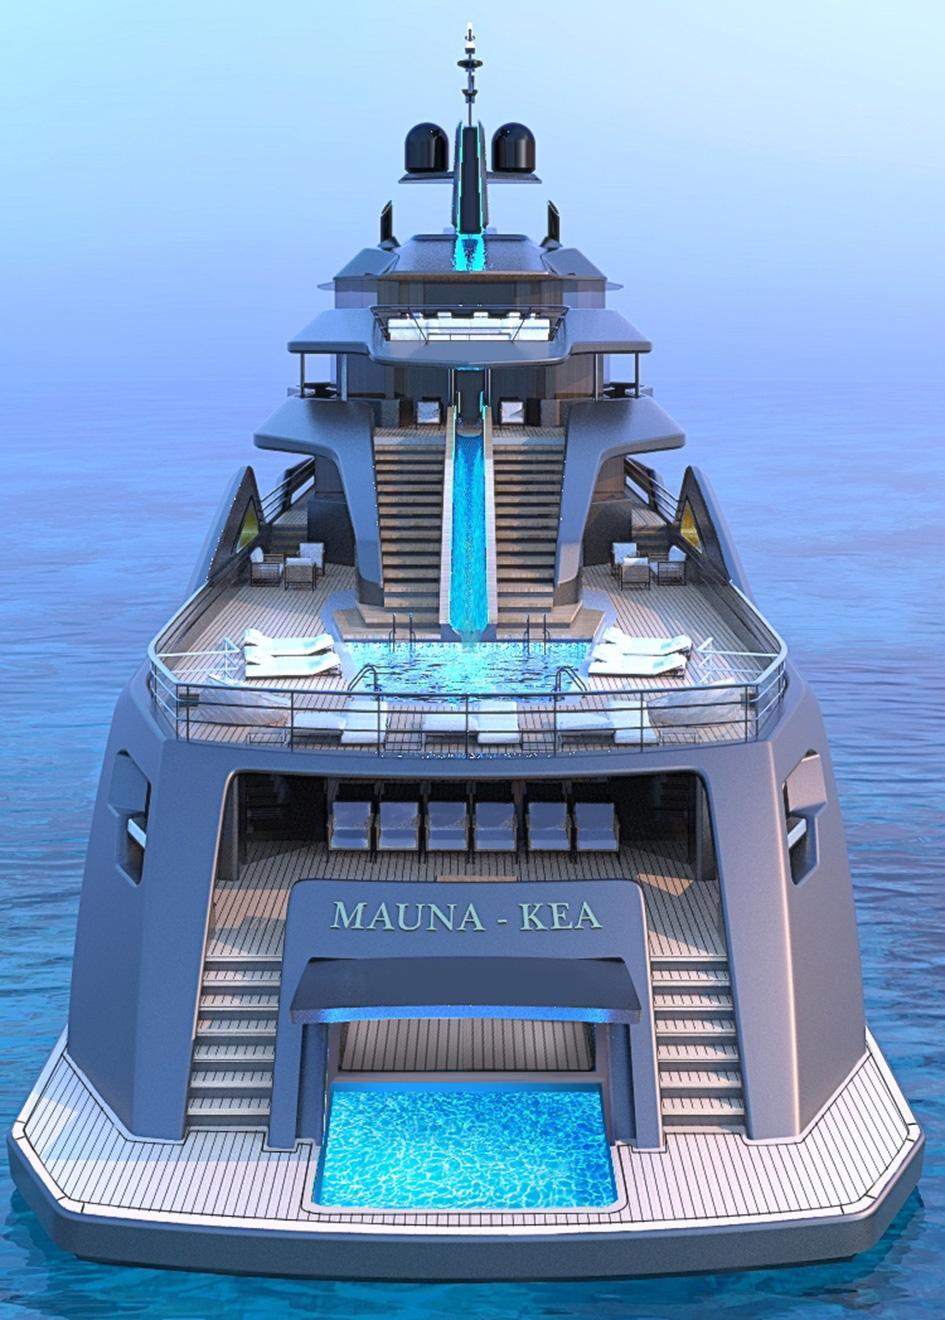 Roberto-Curto-yacht-concept-Mauna-Kea-aft-view